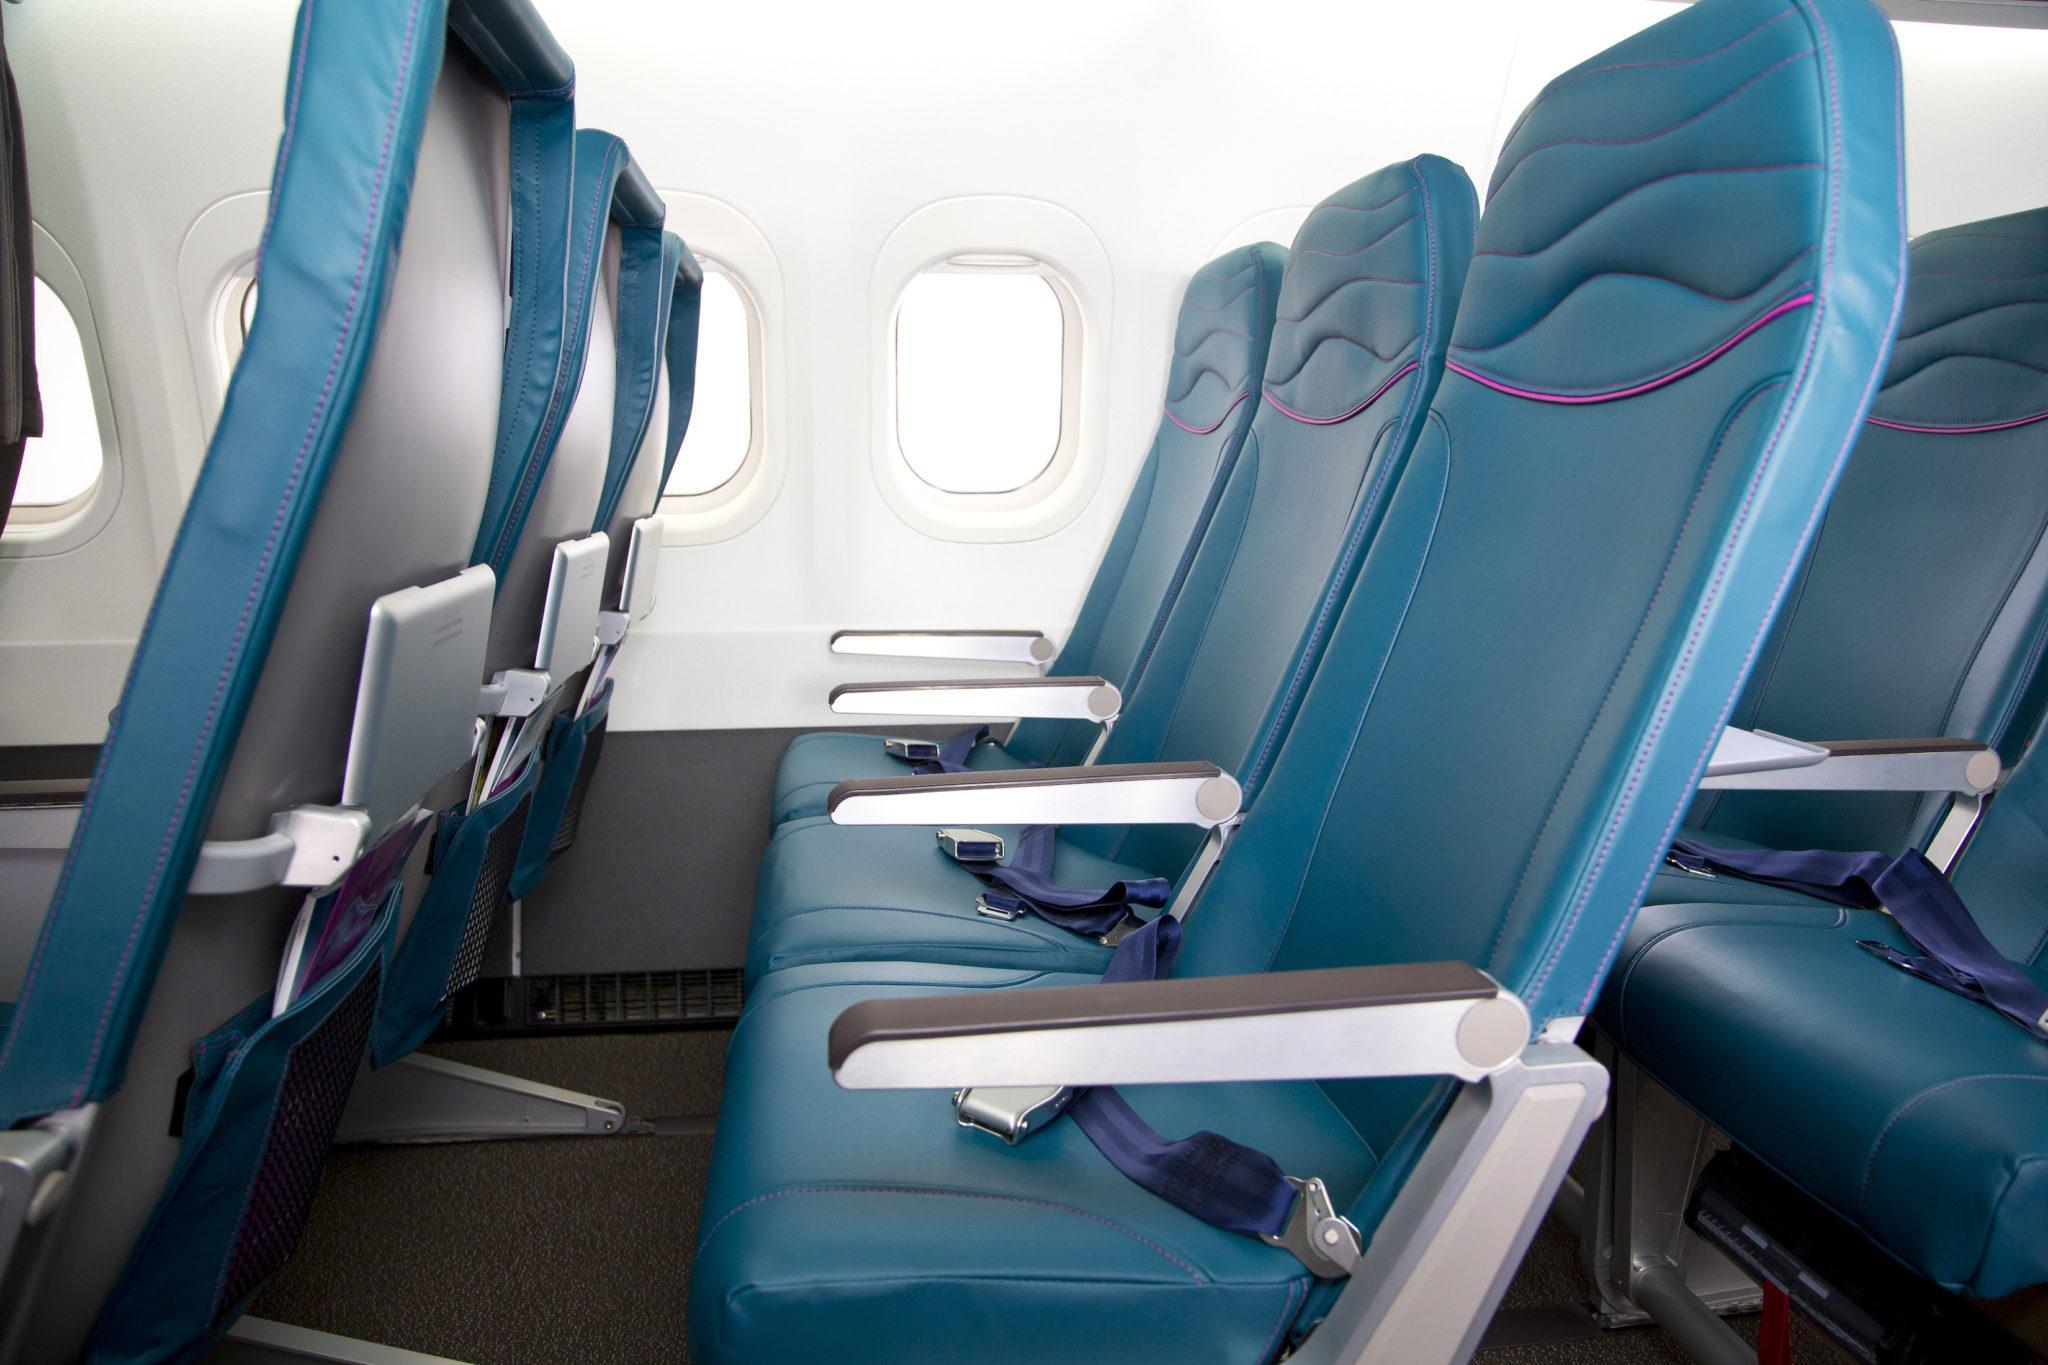 hawaiian-airlines-acro-boeing-717-slimline-economy-side